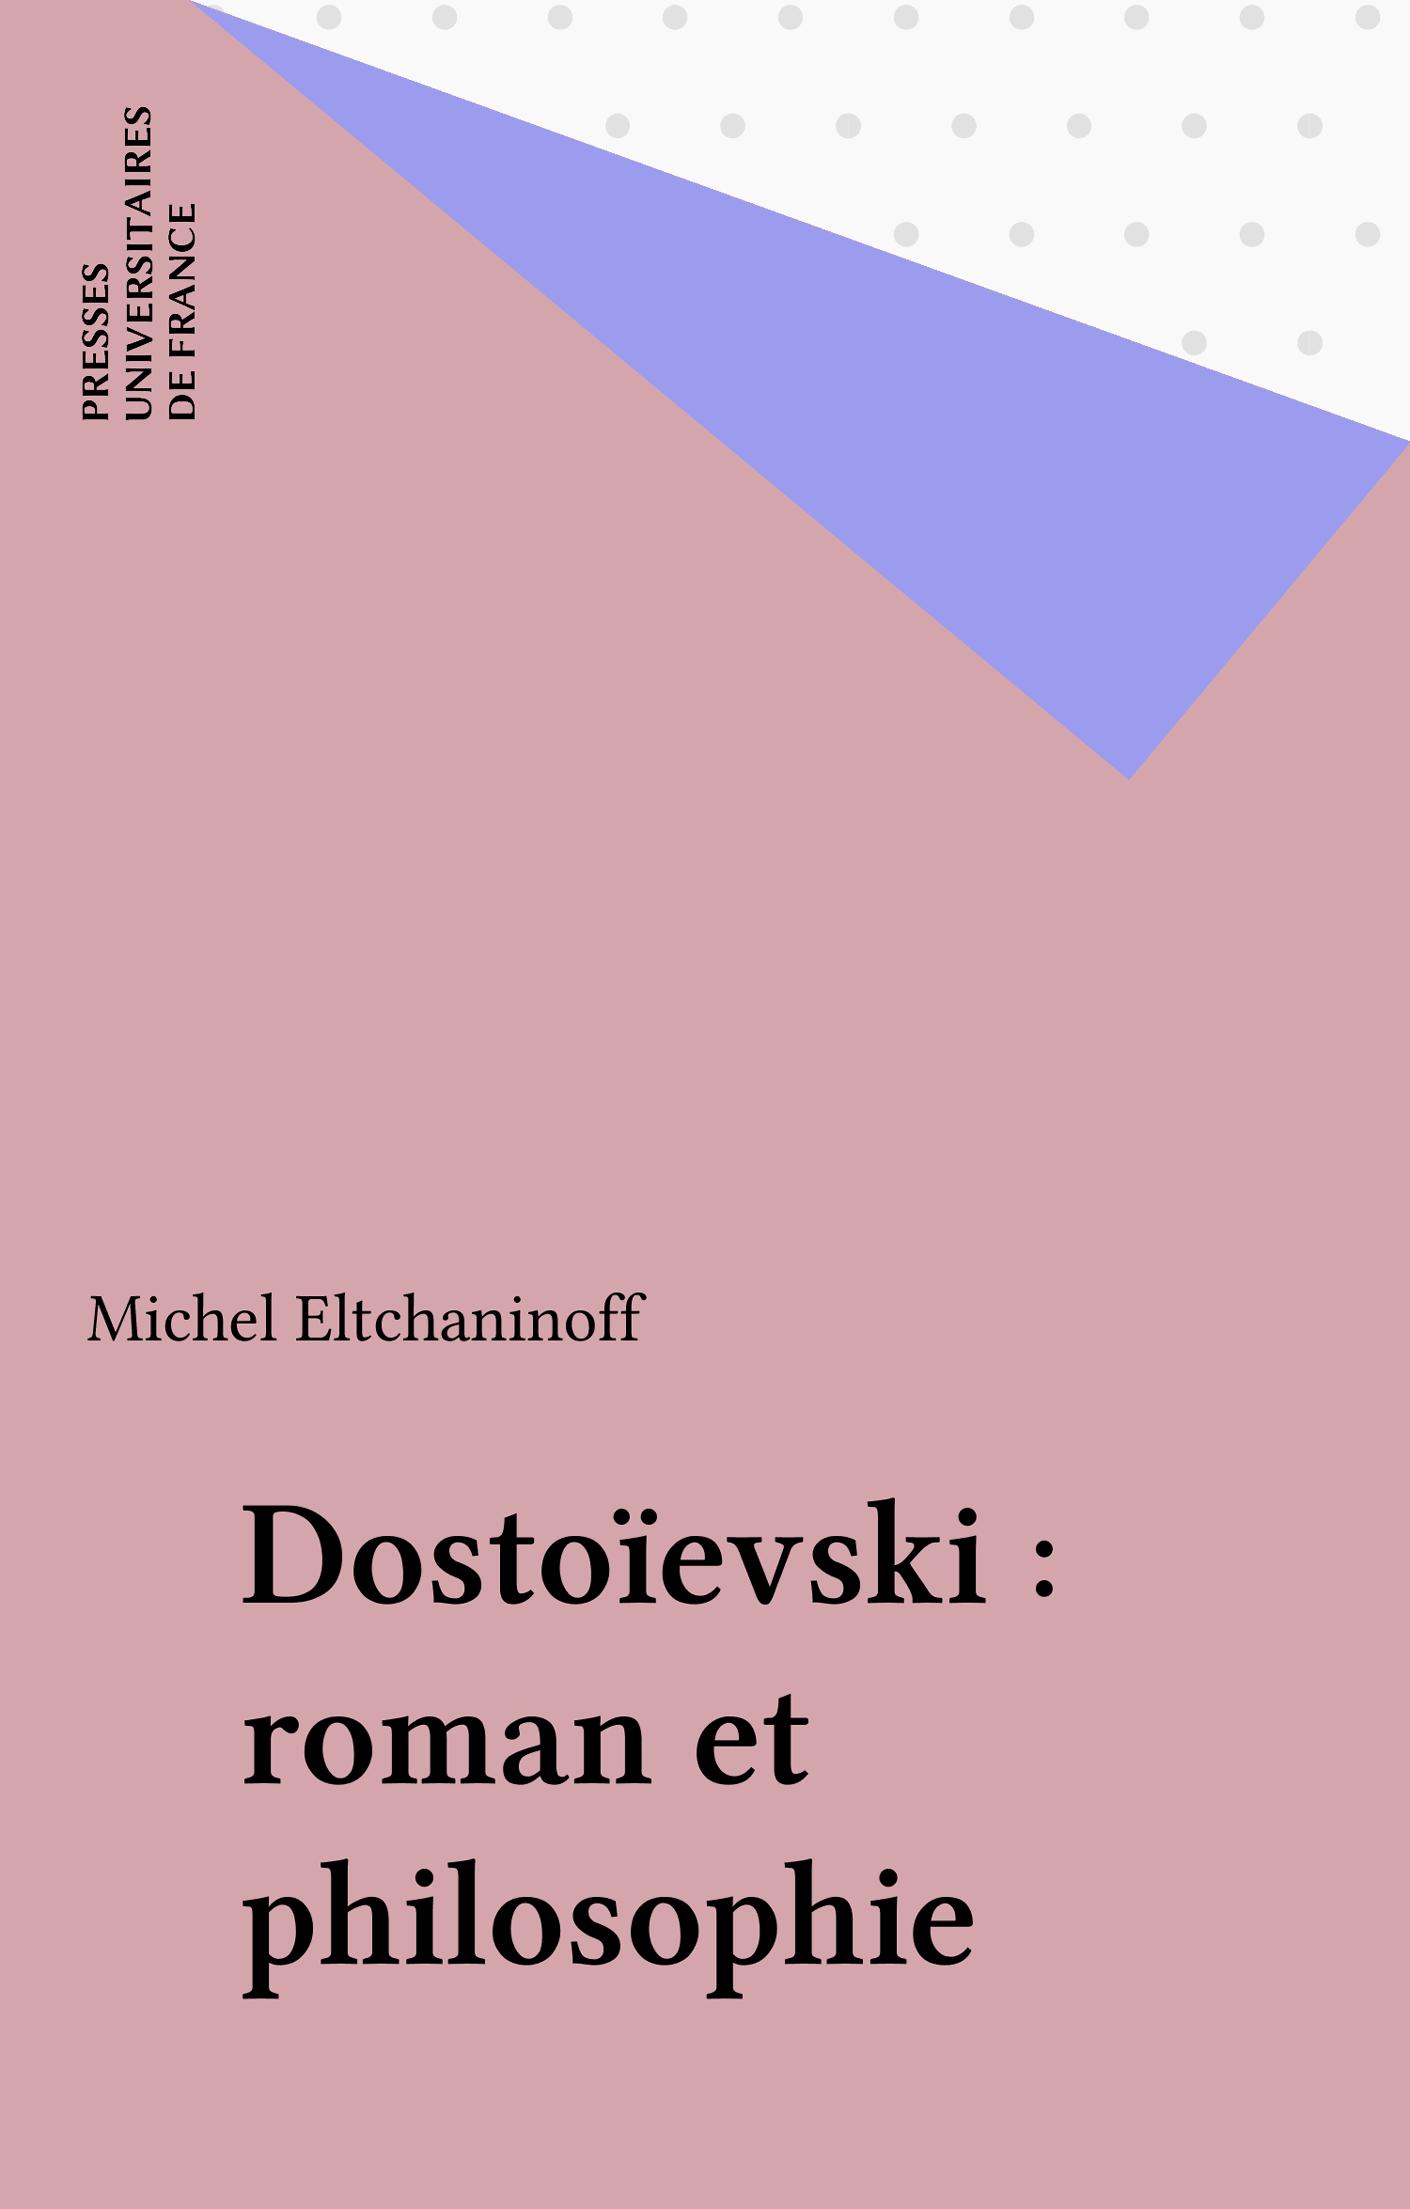 Dostoïevski : roman et philosophie